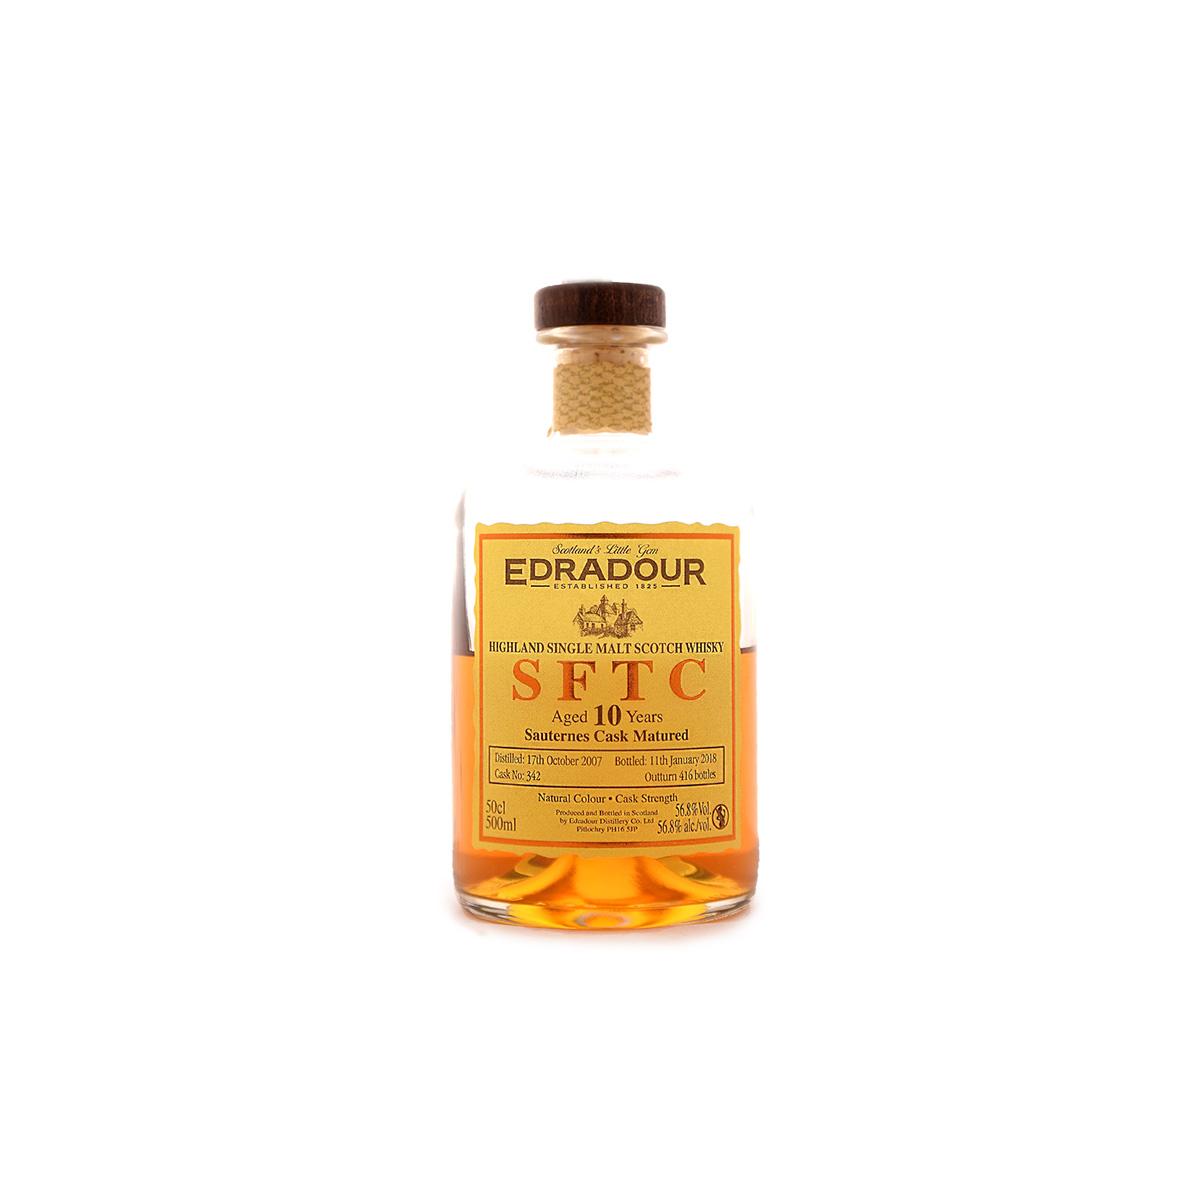 Edradour SFTC Sauternes (56,8%) - 30 ml.